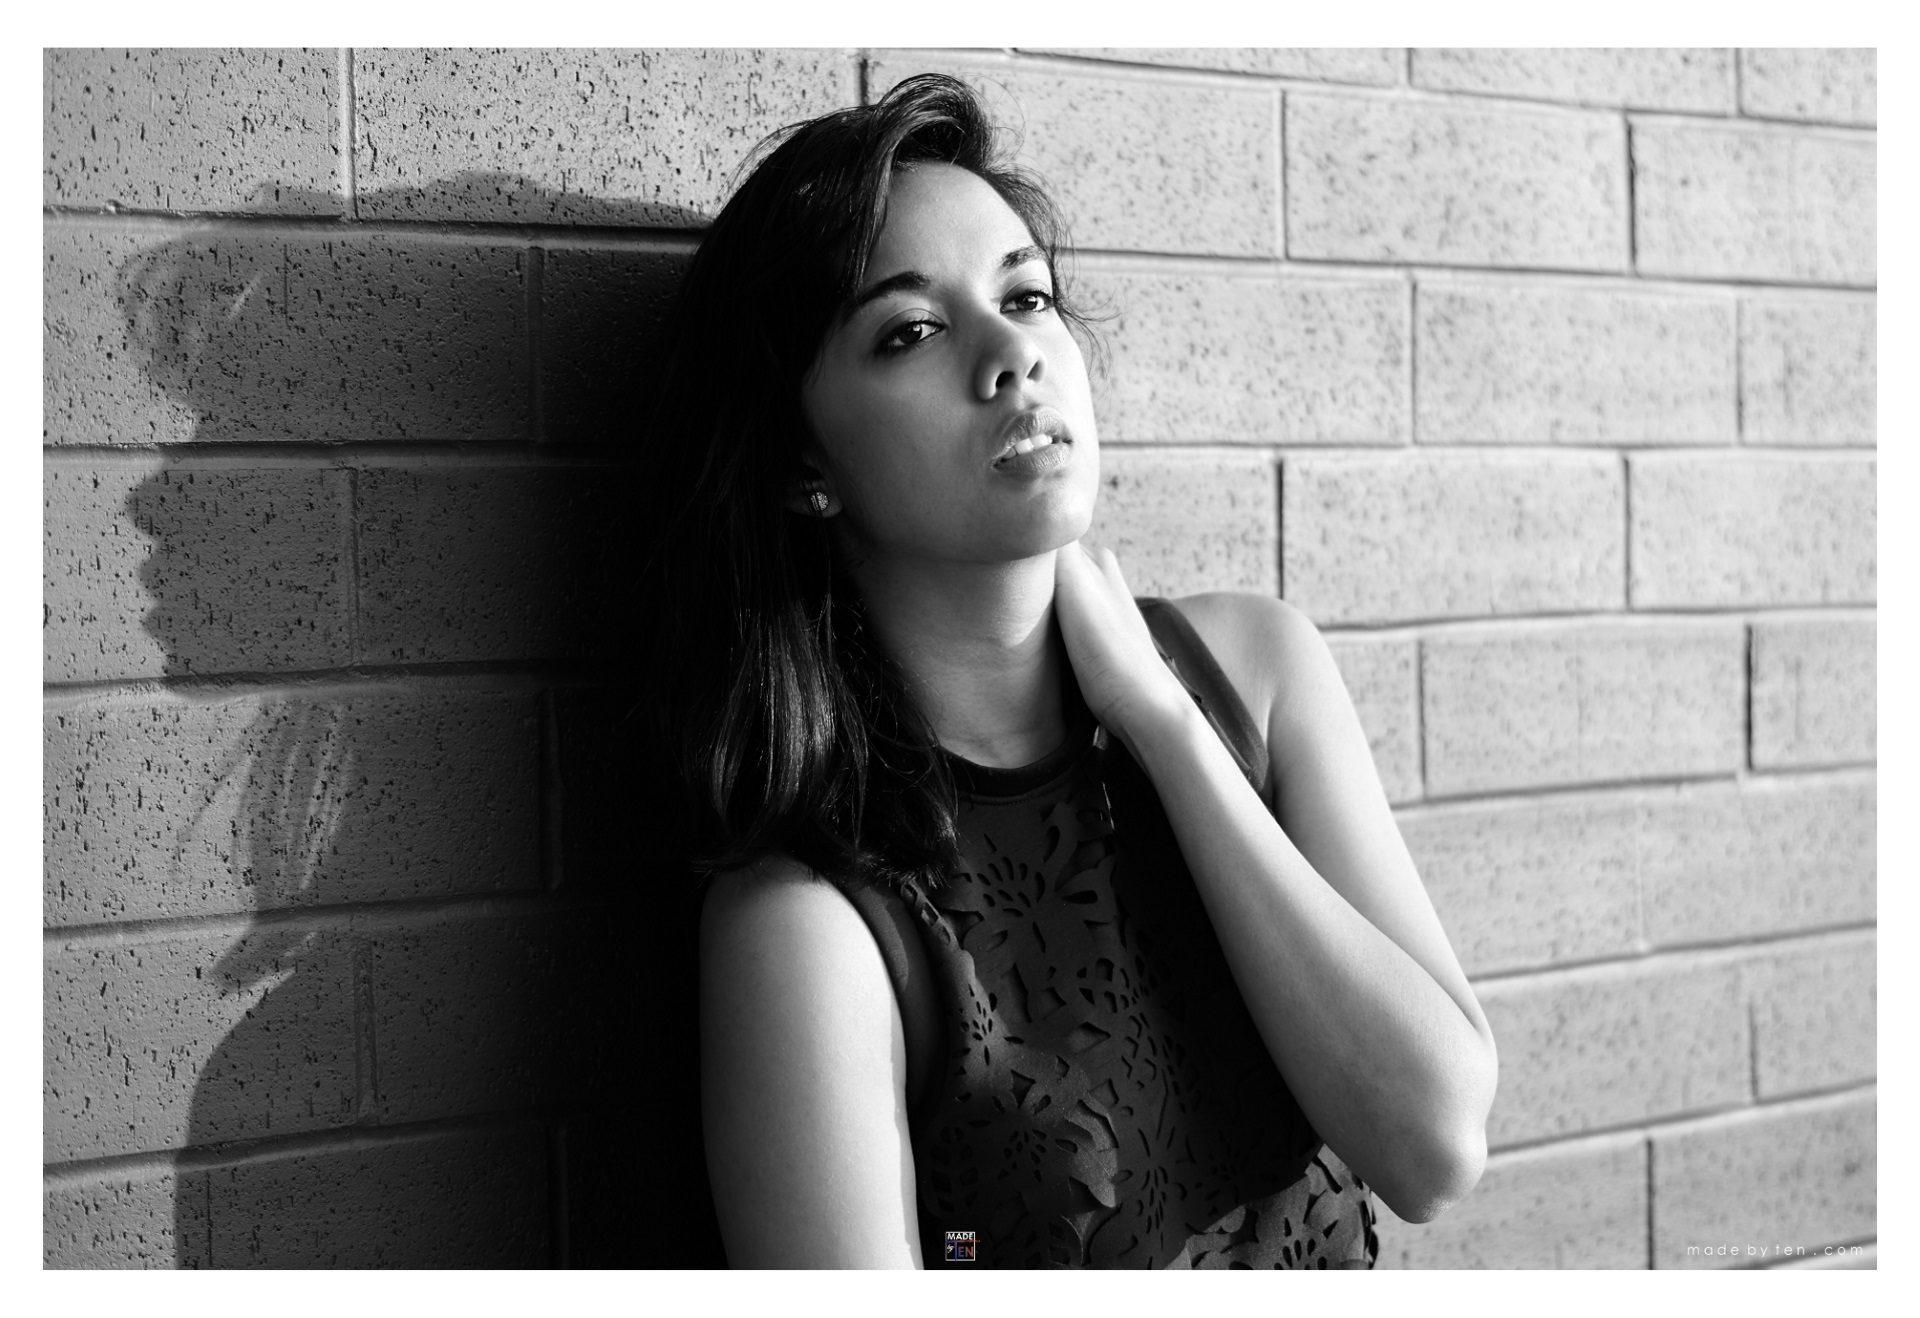 Woman Brick Wall - GTA Women Portrait Photography